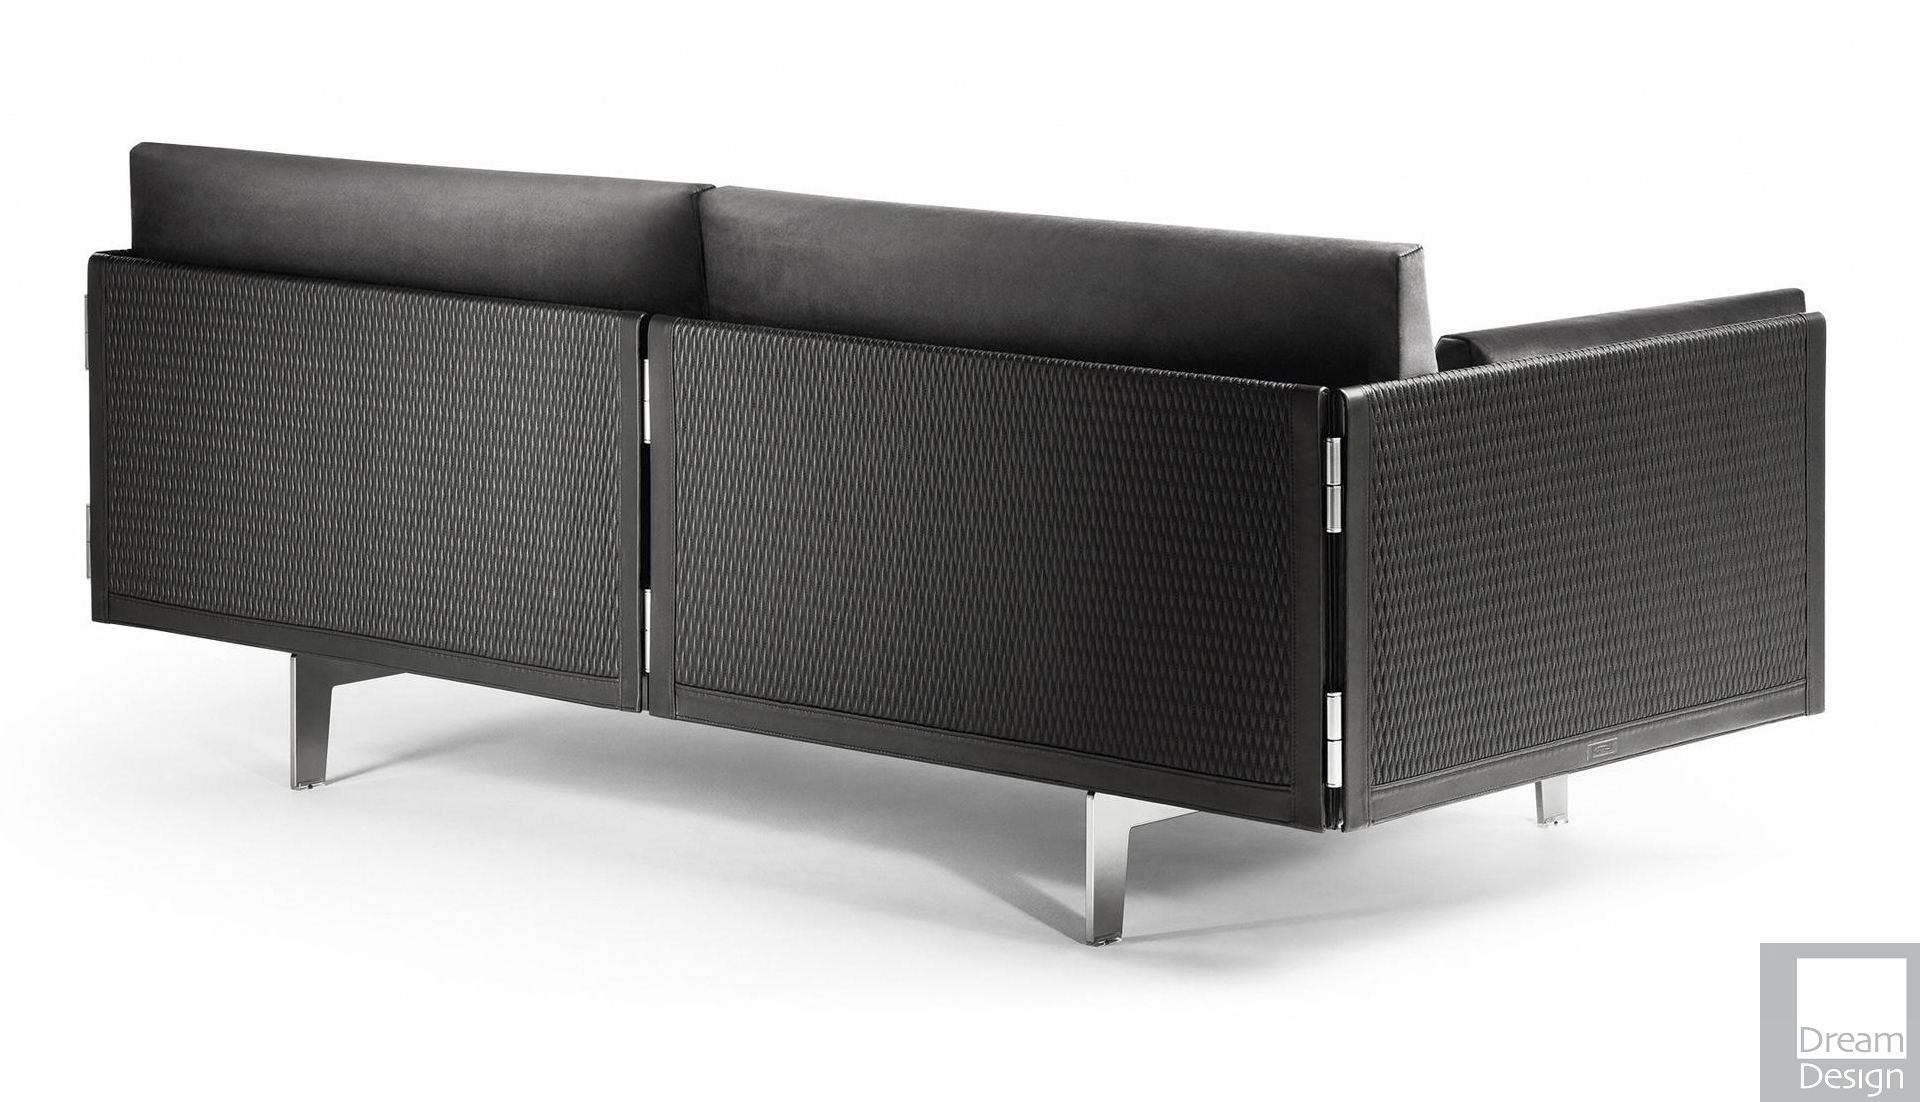 Poltrona Frau Clayton 2 Seater Sofa By Jean Marie Massaud